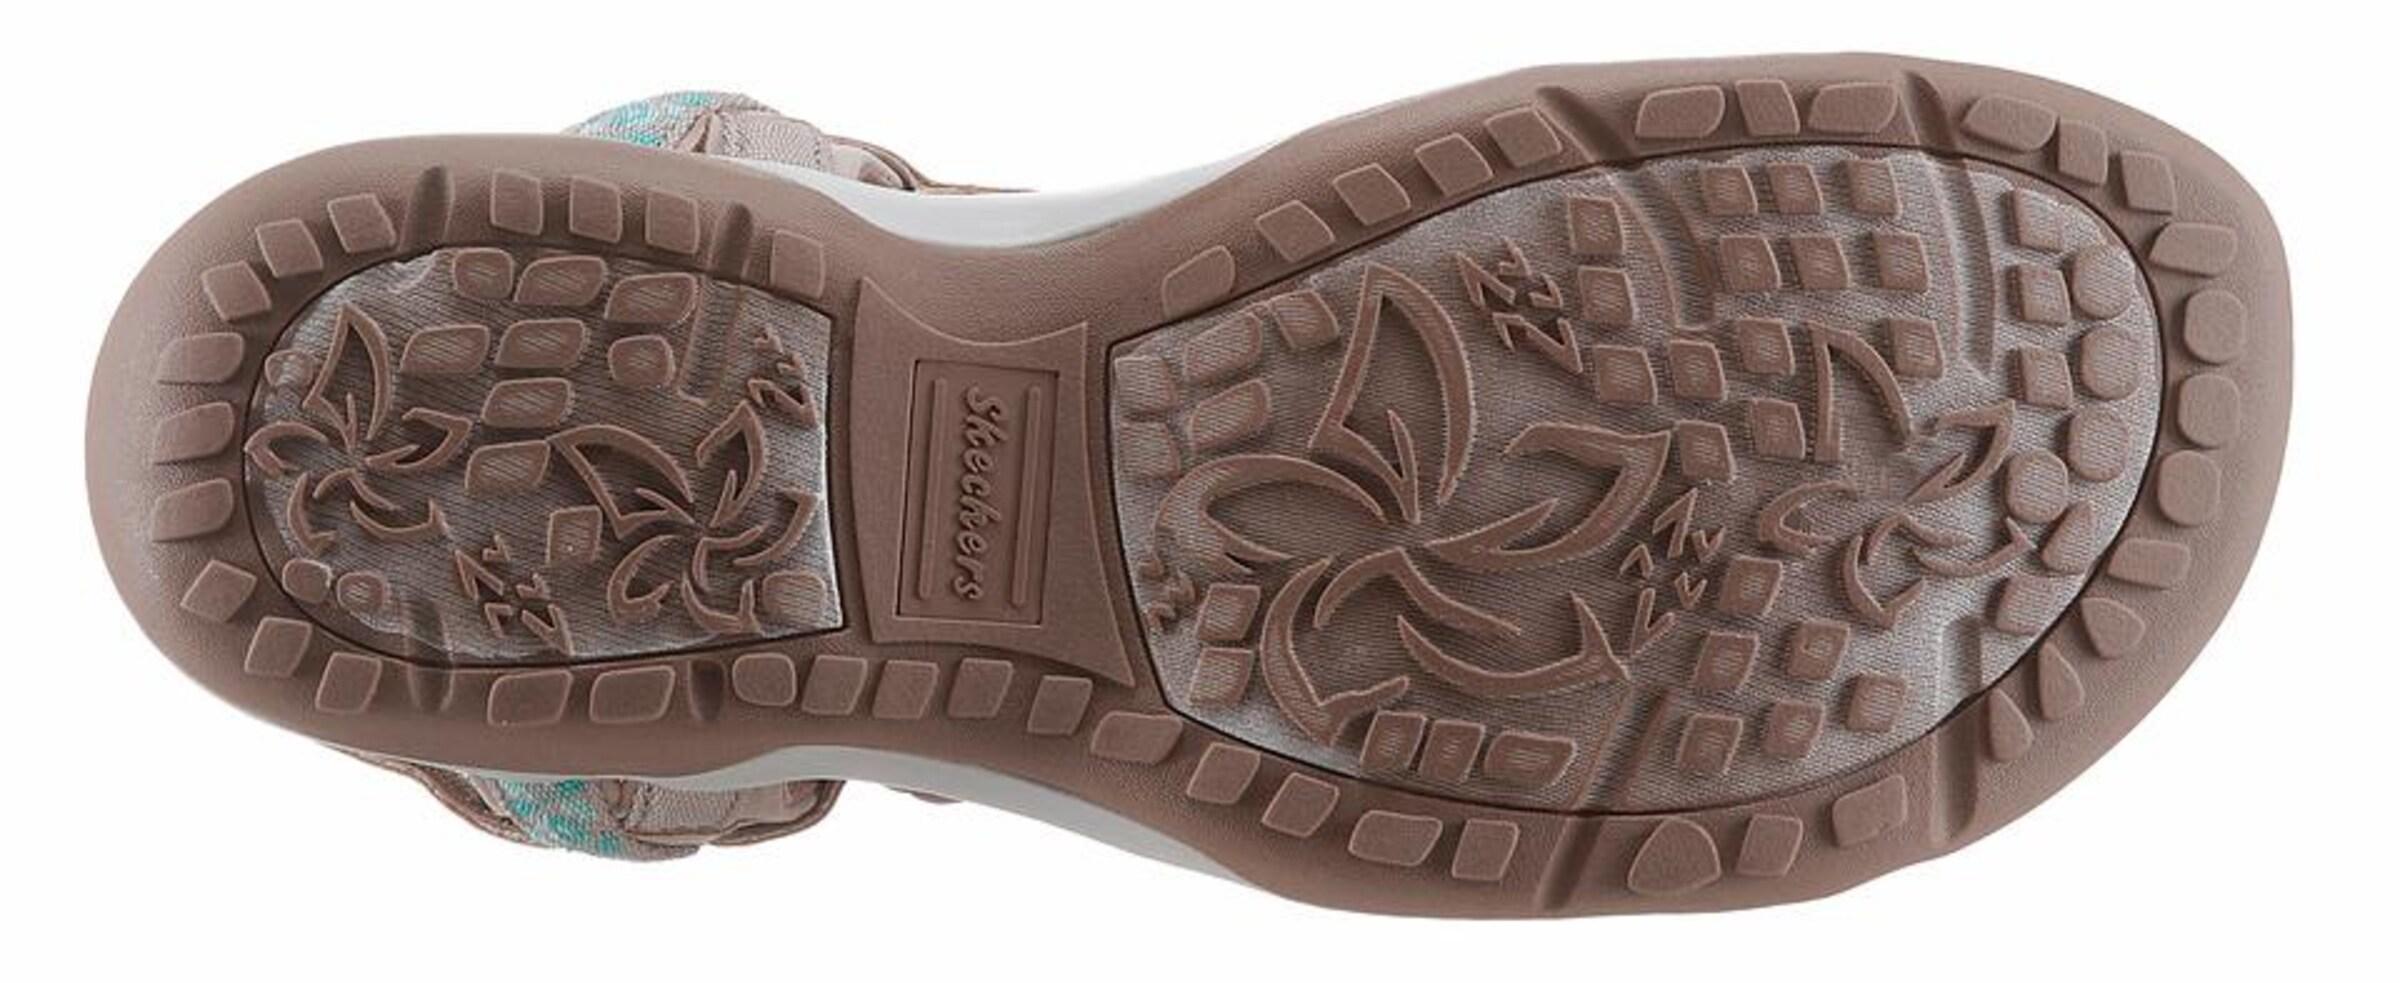 In Sandale Skechers In Skechers Sandale Taupe Sandale Taupe Skechers wnk0N8OPXZ